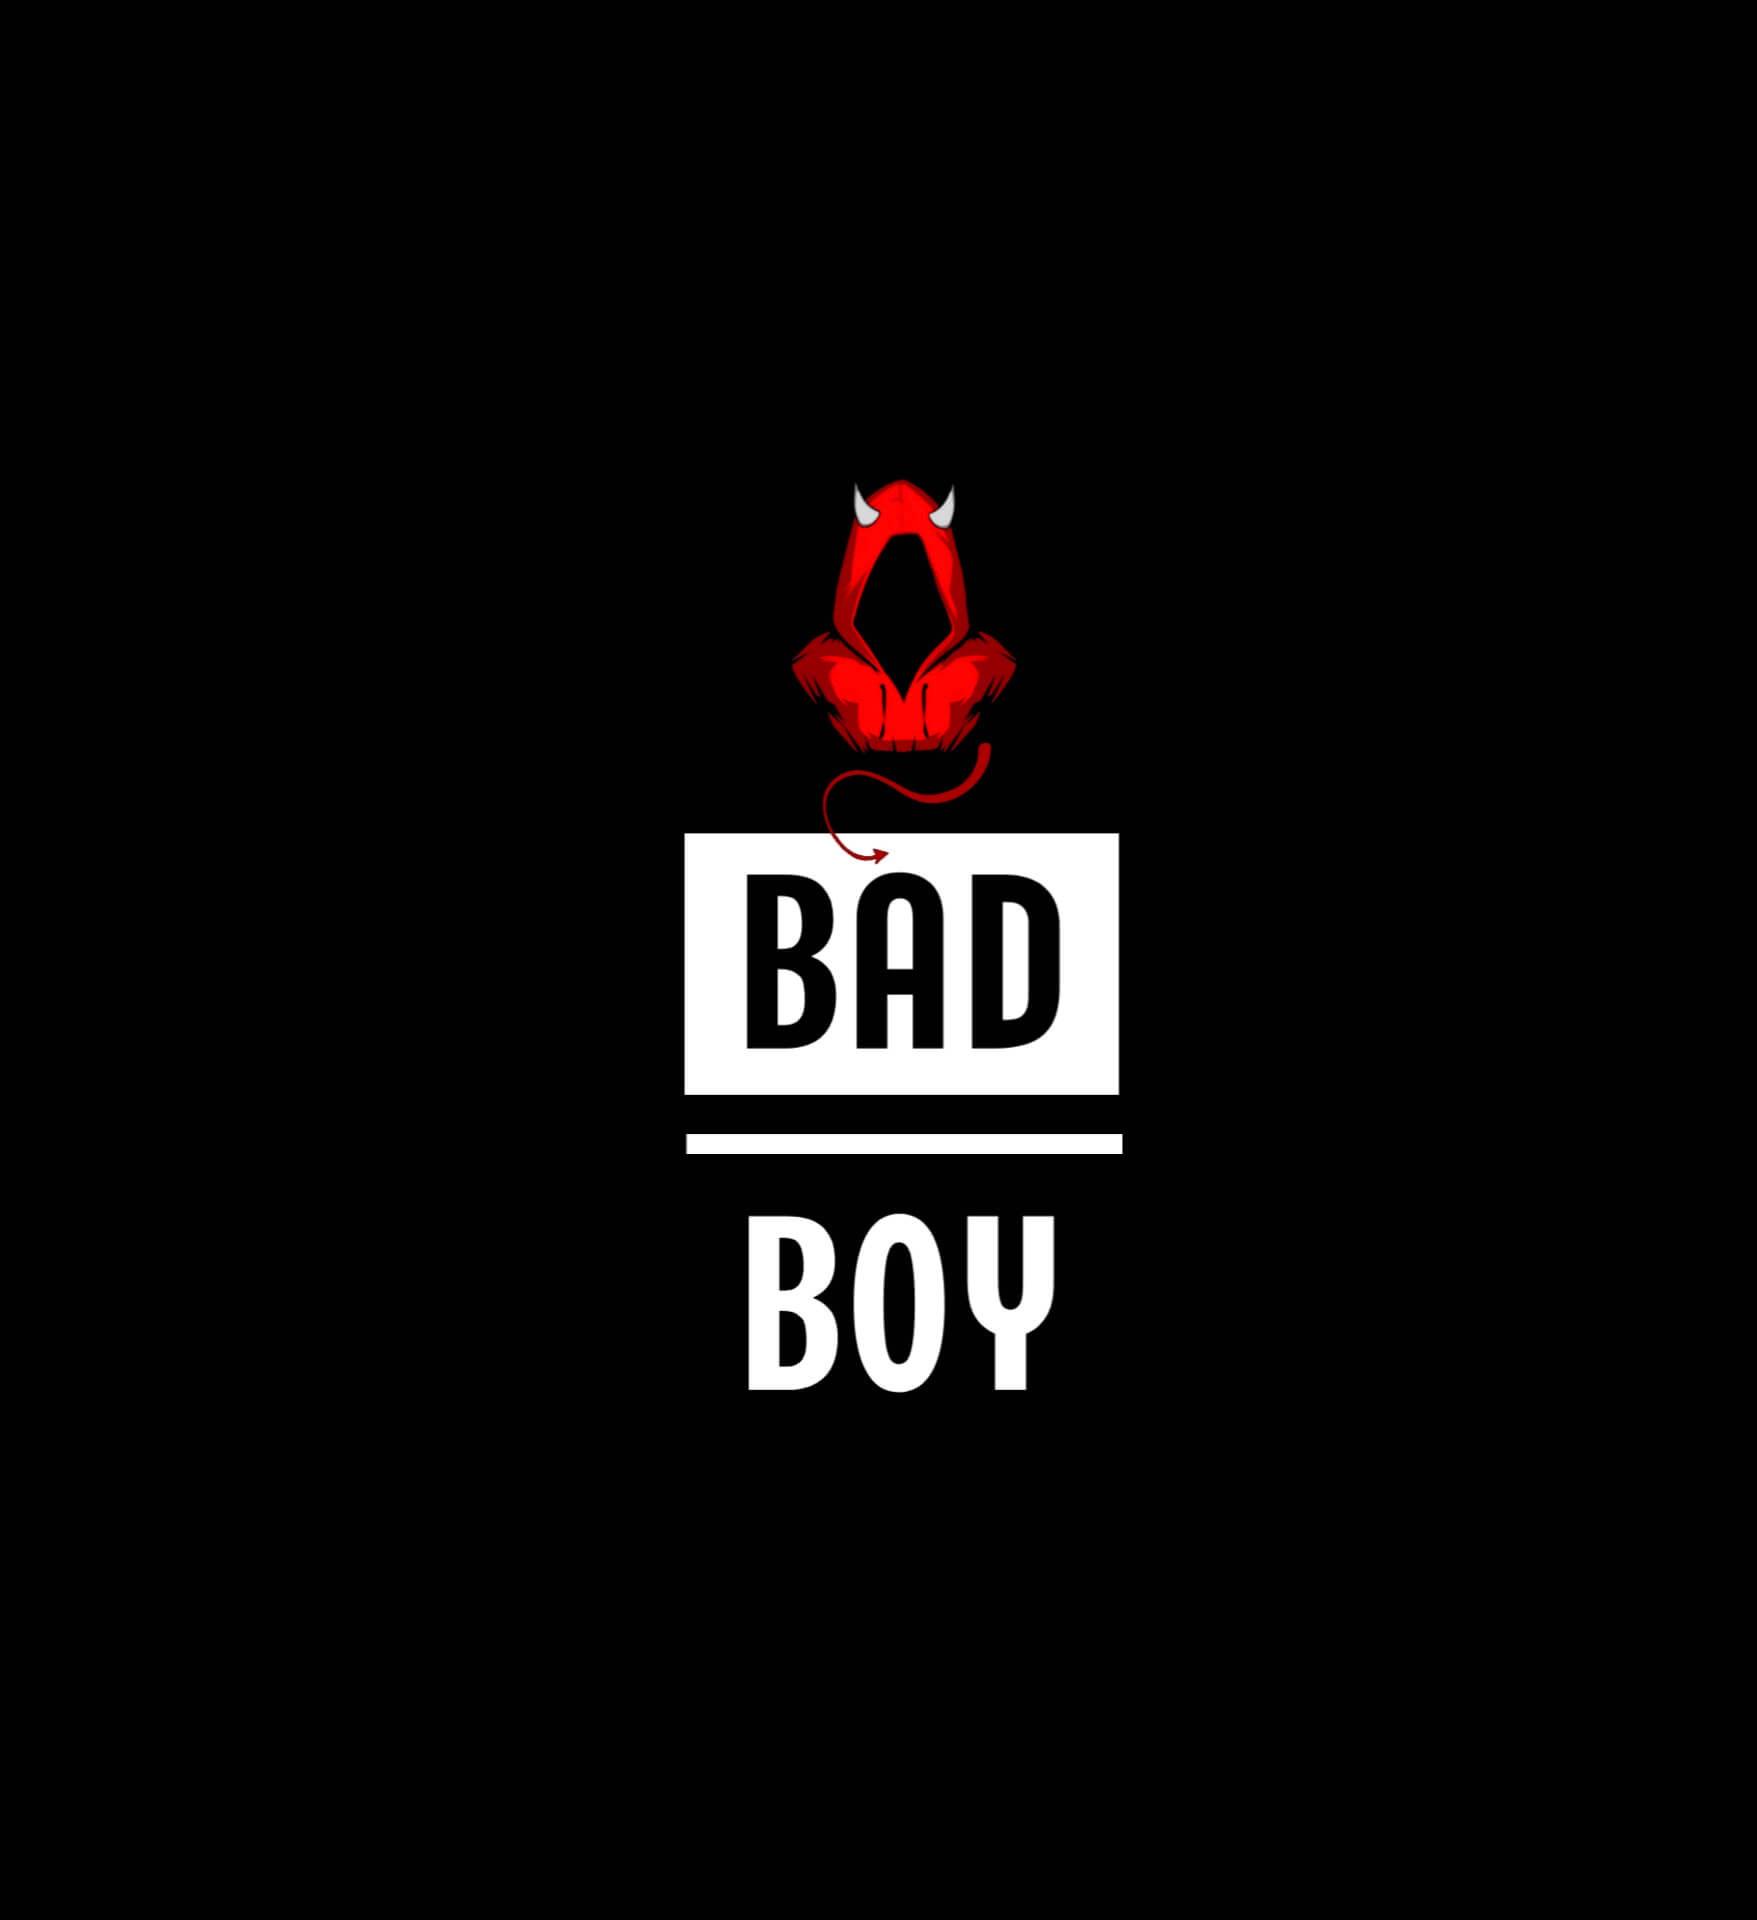 hd boy Status Dp Images pics